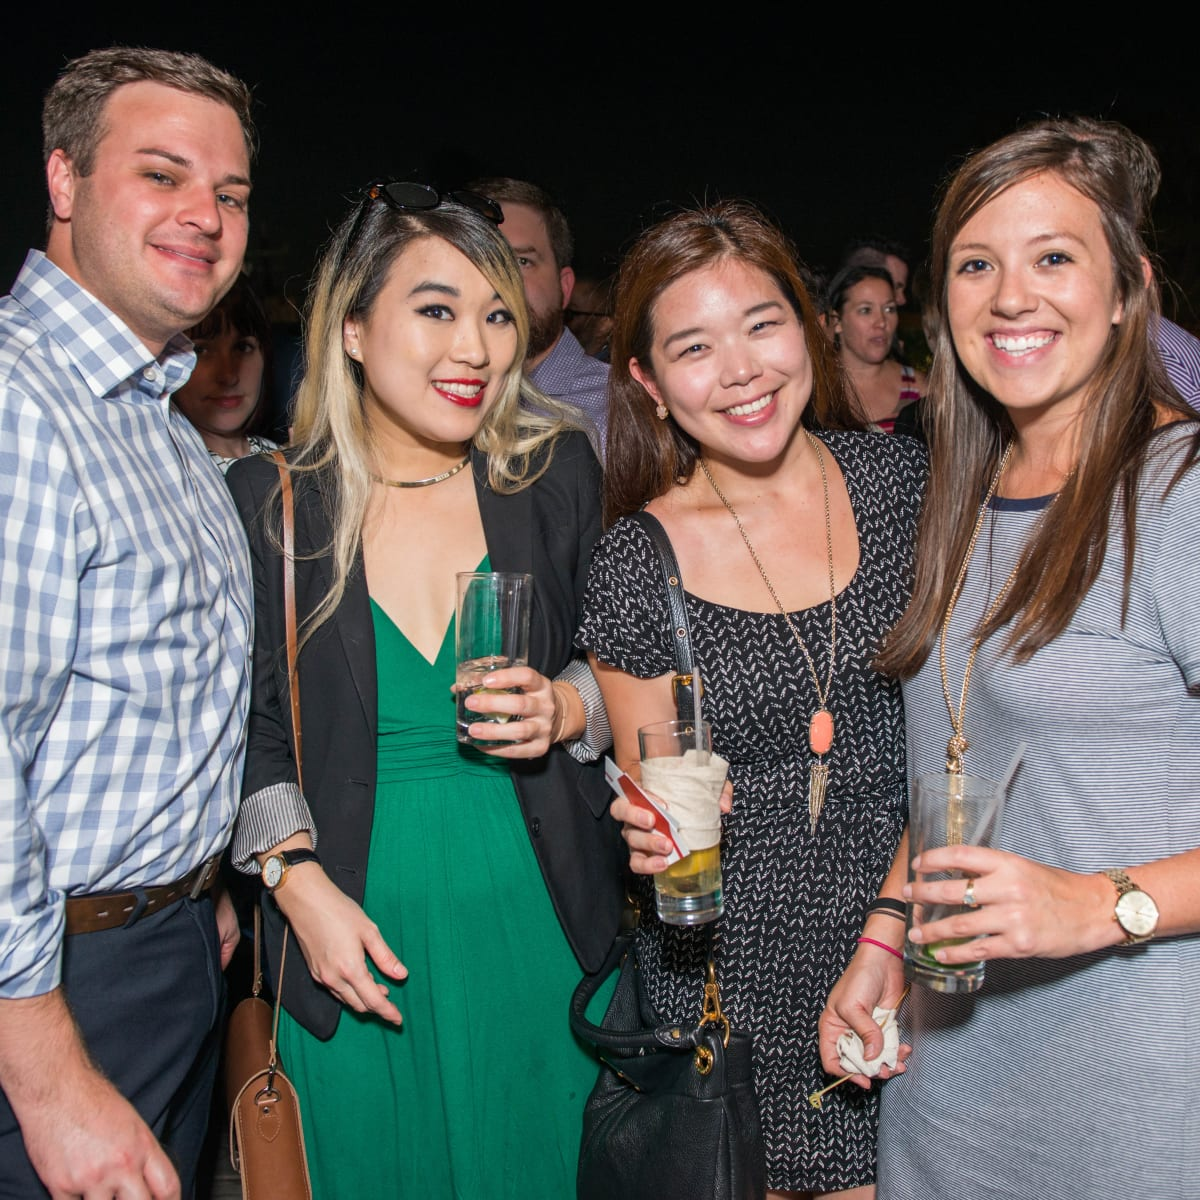 News, CultureMap Social, B&B Butchers, Sept. 2015  Travis Jenner, Lily Chun, Jane Chun, Carolina Keating